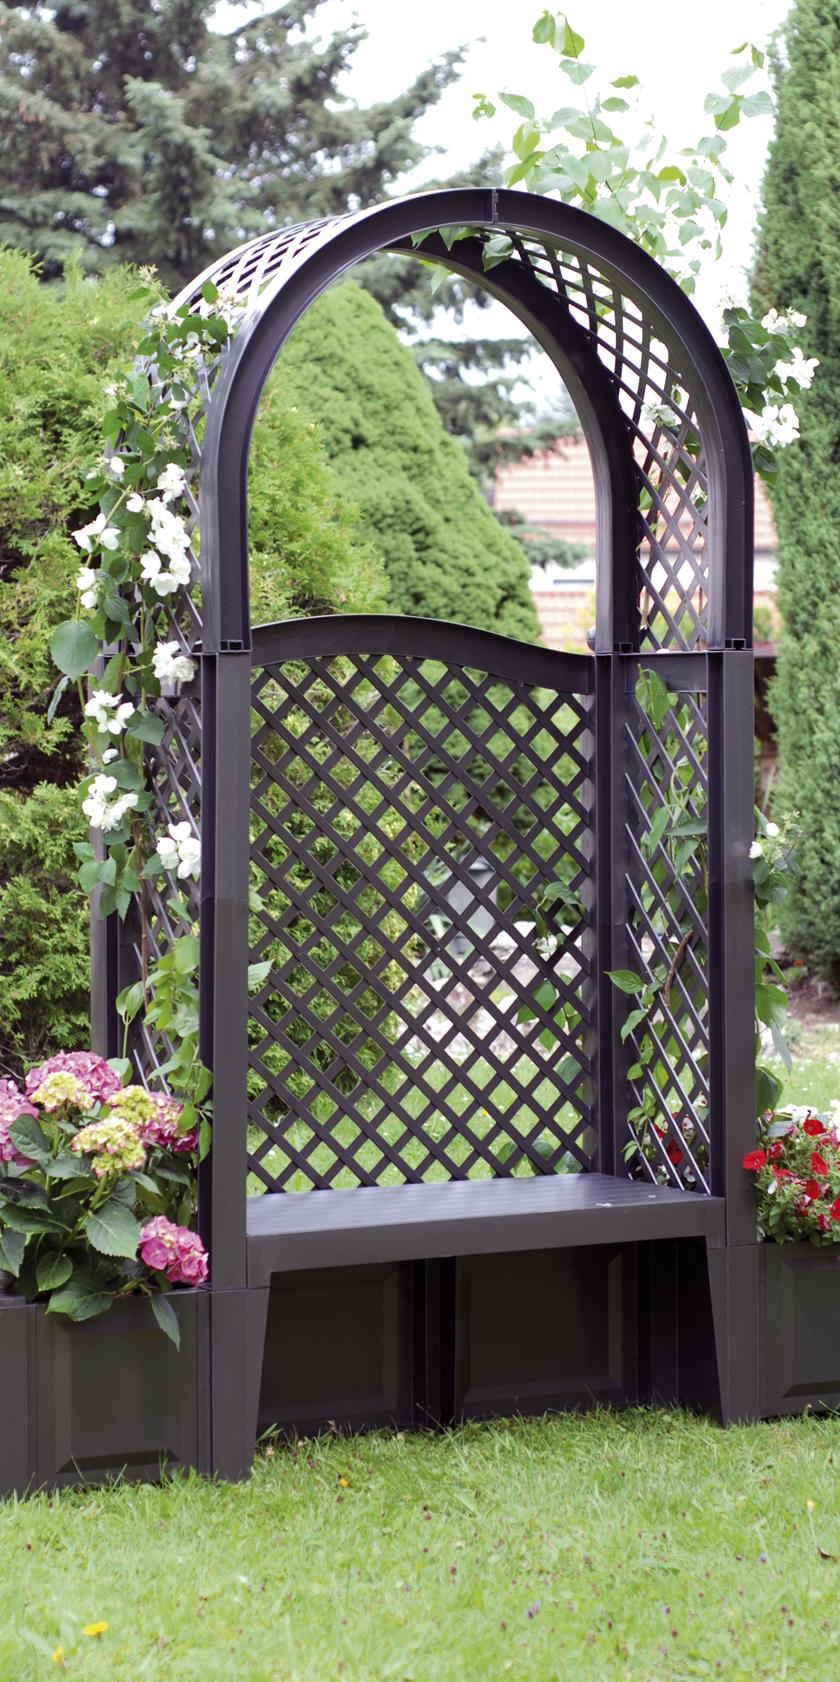 Cool Plastic Arbour Garden Ideas Outdoor Furniture Bench Andrewgaddart Wooden Chair Designs For Living Room Andrewgaddartcom